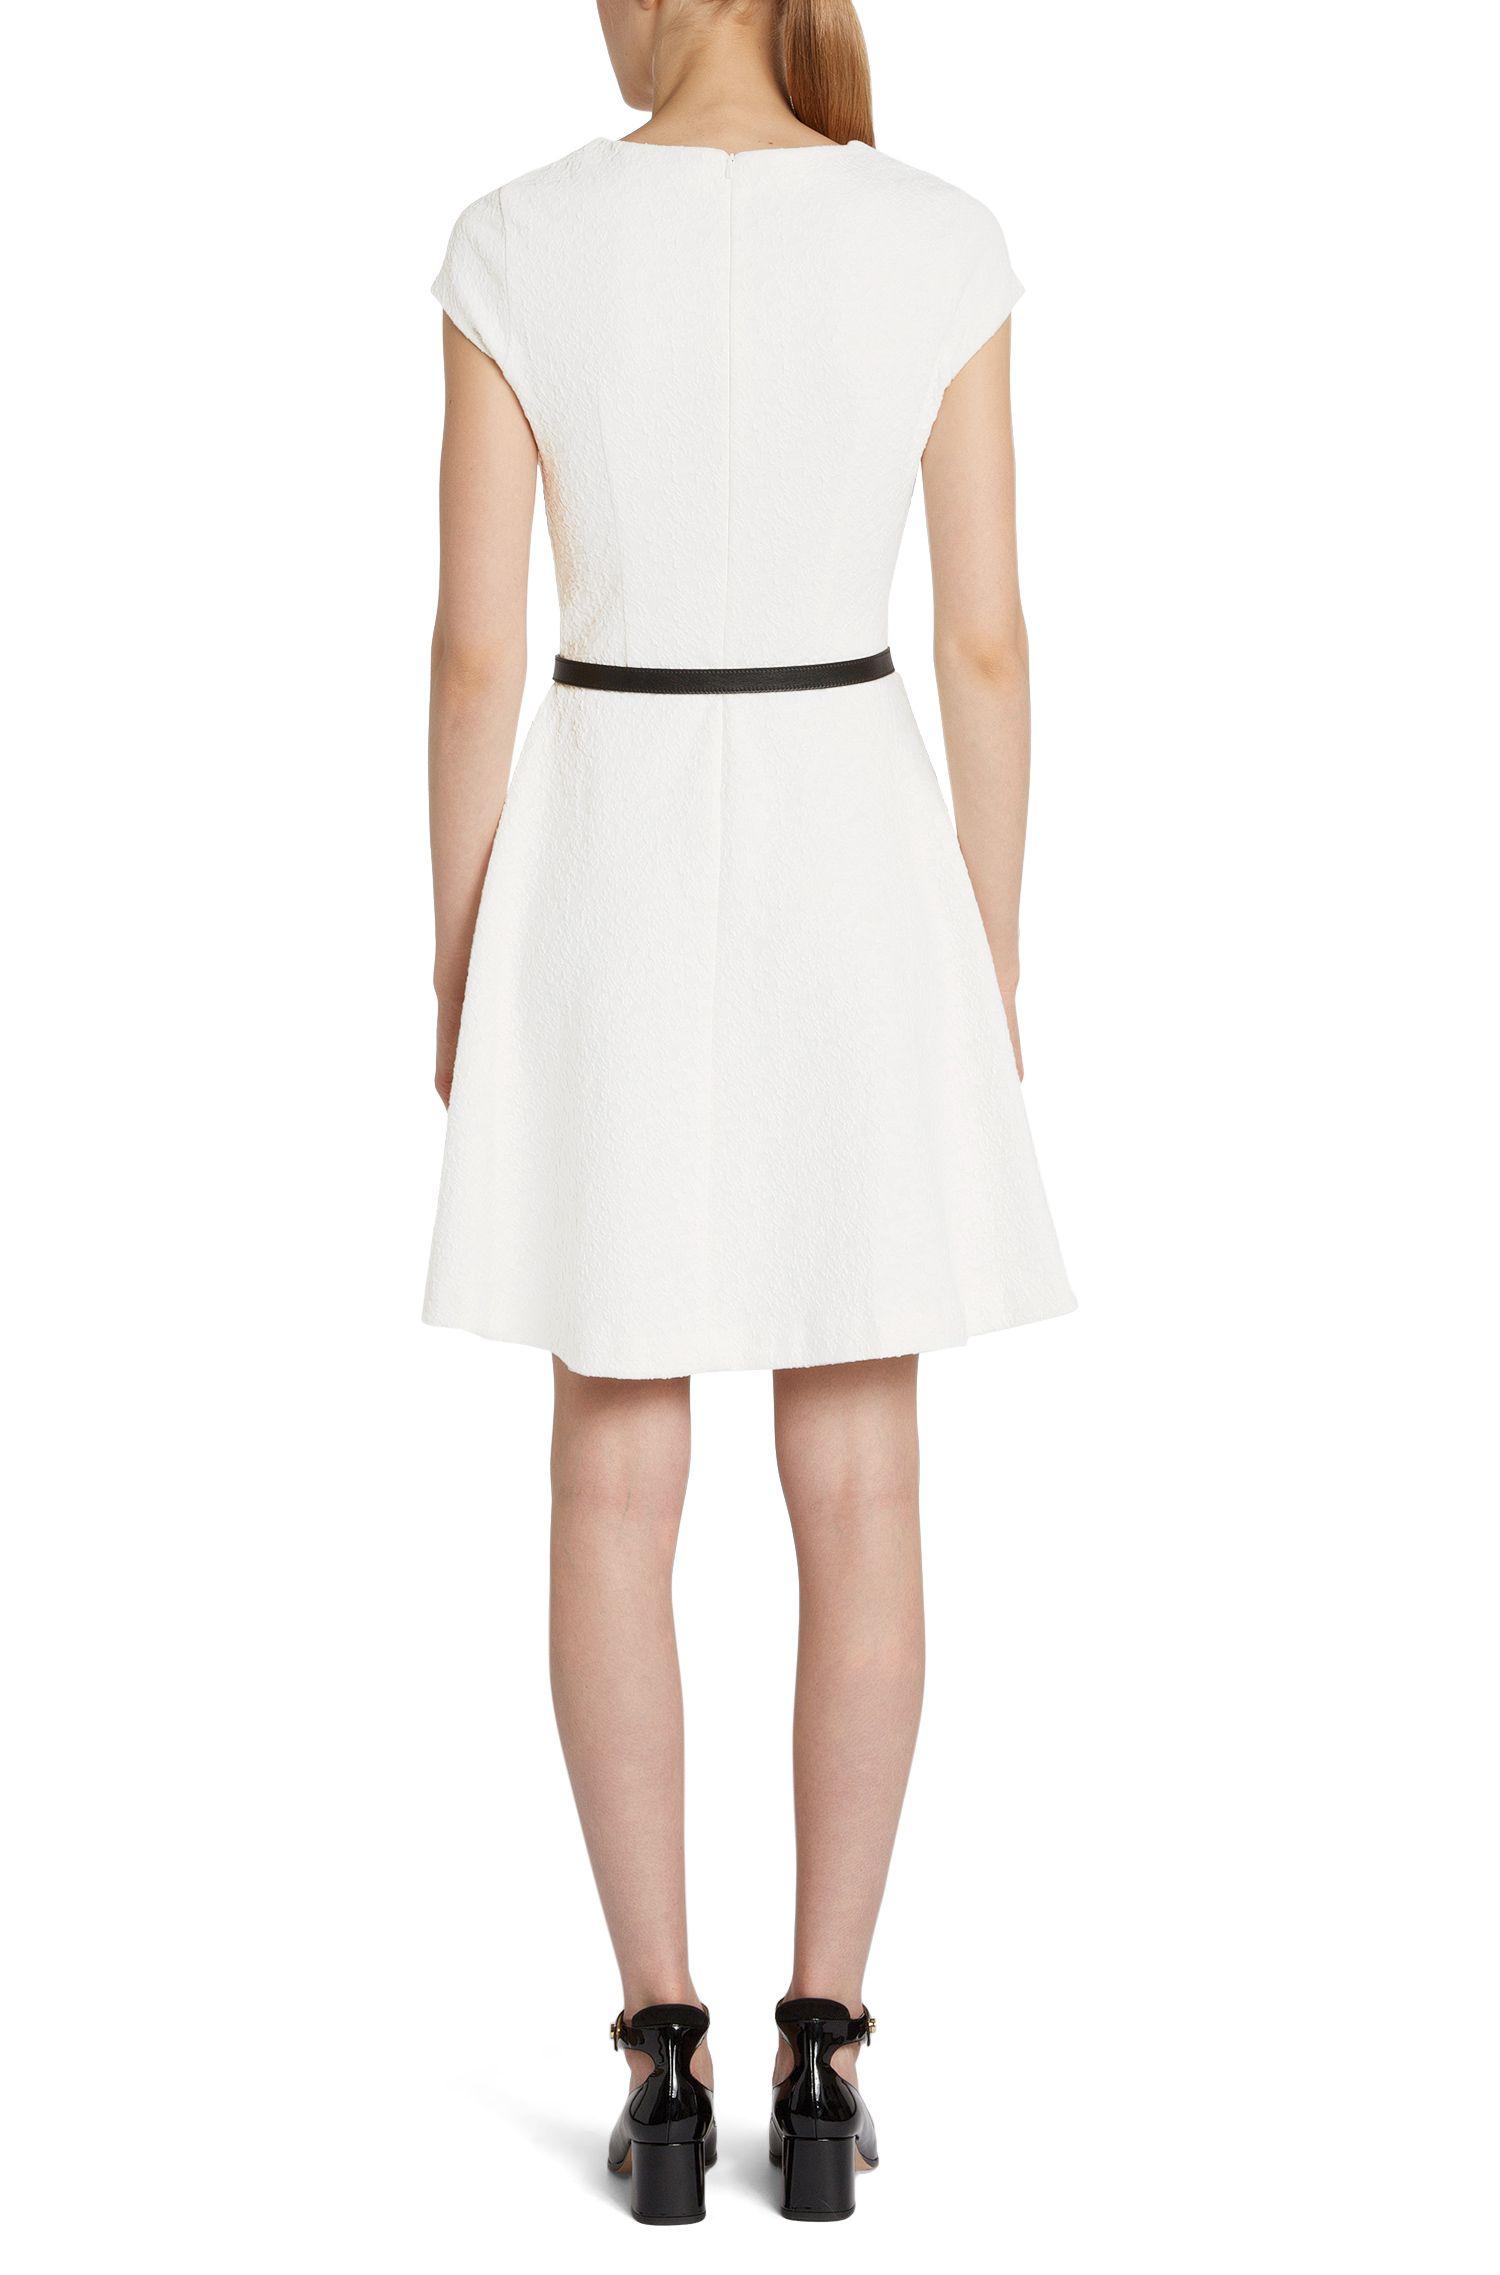 Unifarbenes Kleid mit aufgewebtem Muster: 'Daline'